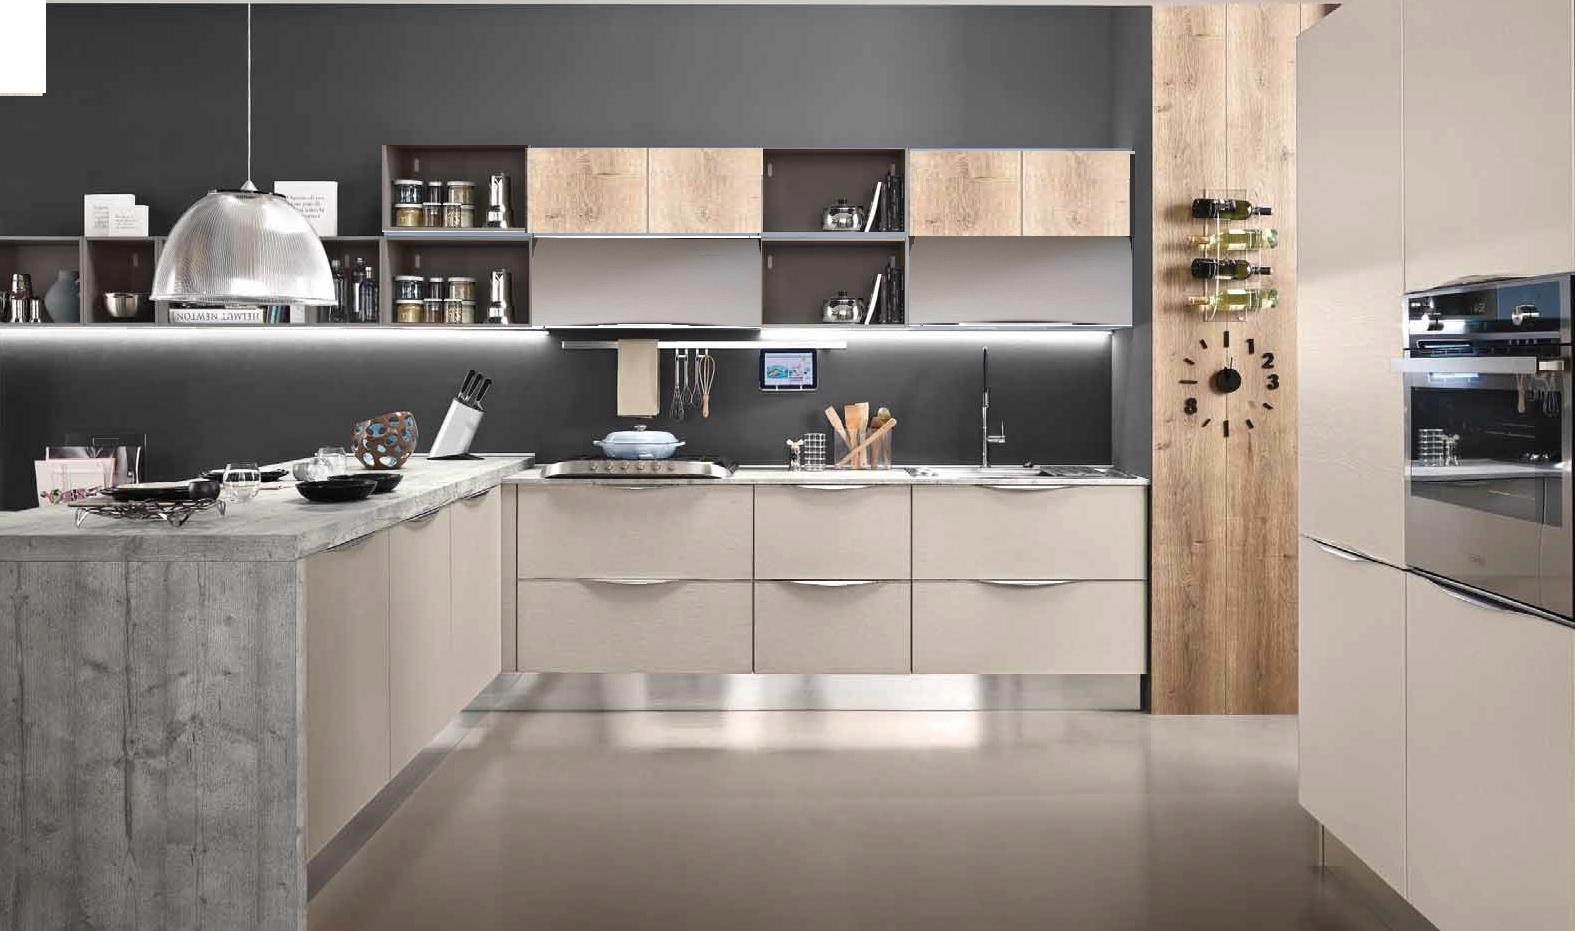 Cucina Moderna Rovere Grigio. Finest Cucina Moderna Rovere Grigio ...